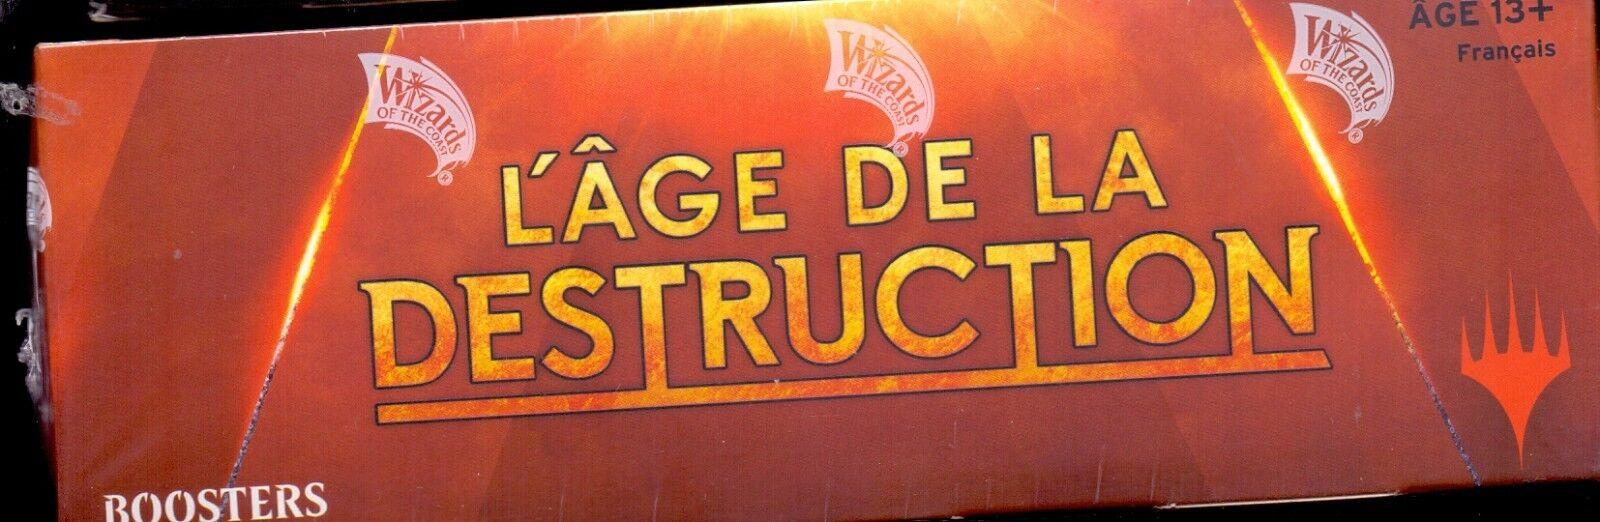 MTG MAGIC  1 BOITE    DE 36 BOOSTERS L'AGE DE LA DESTRUCTION VF e032a4